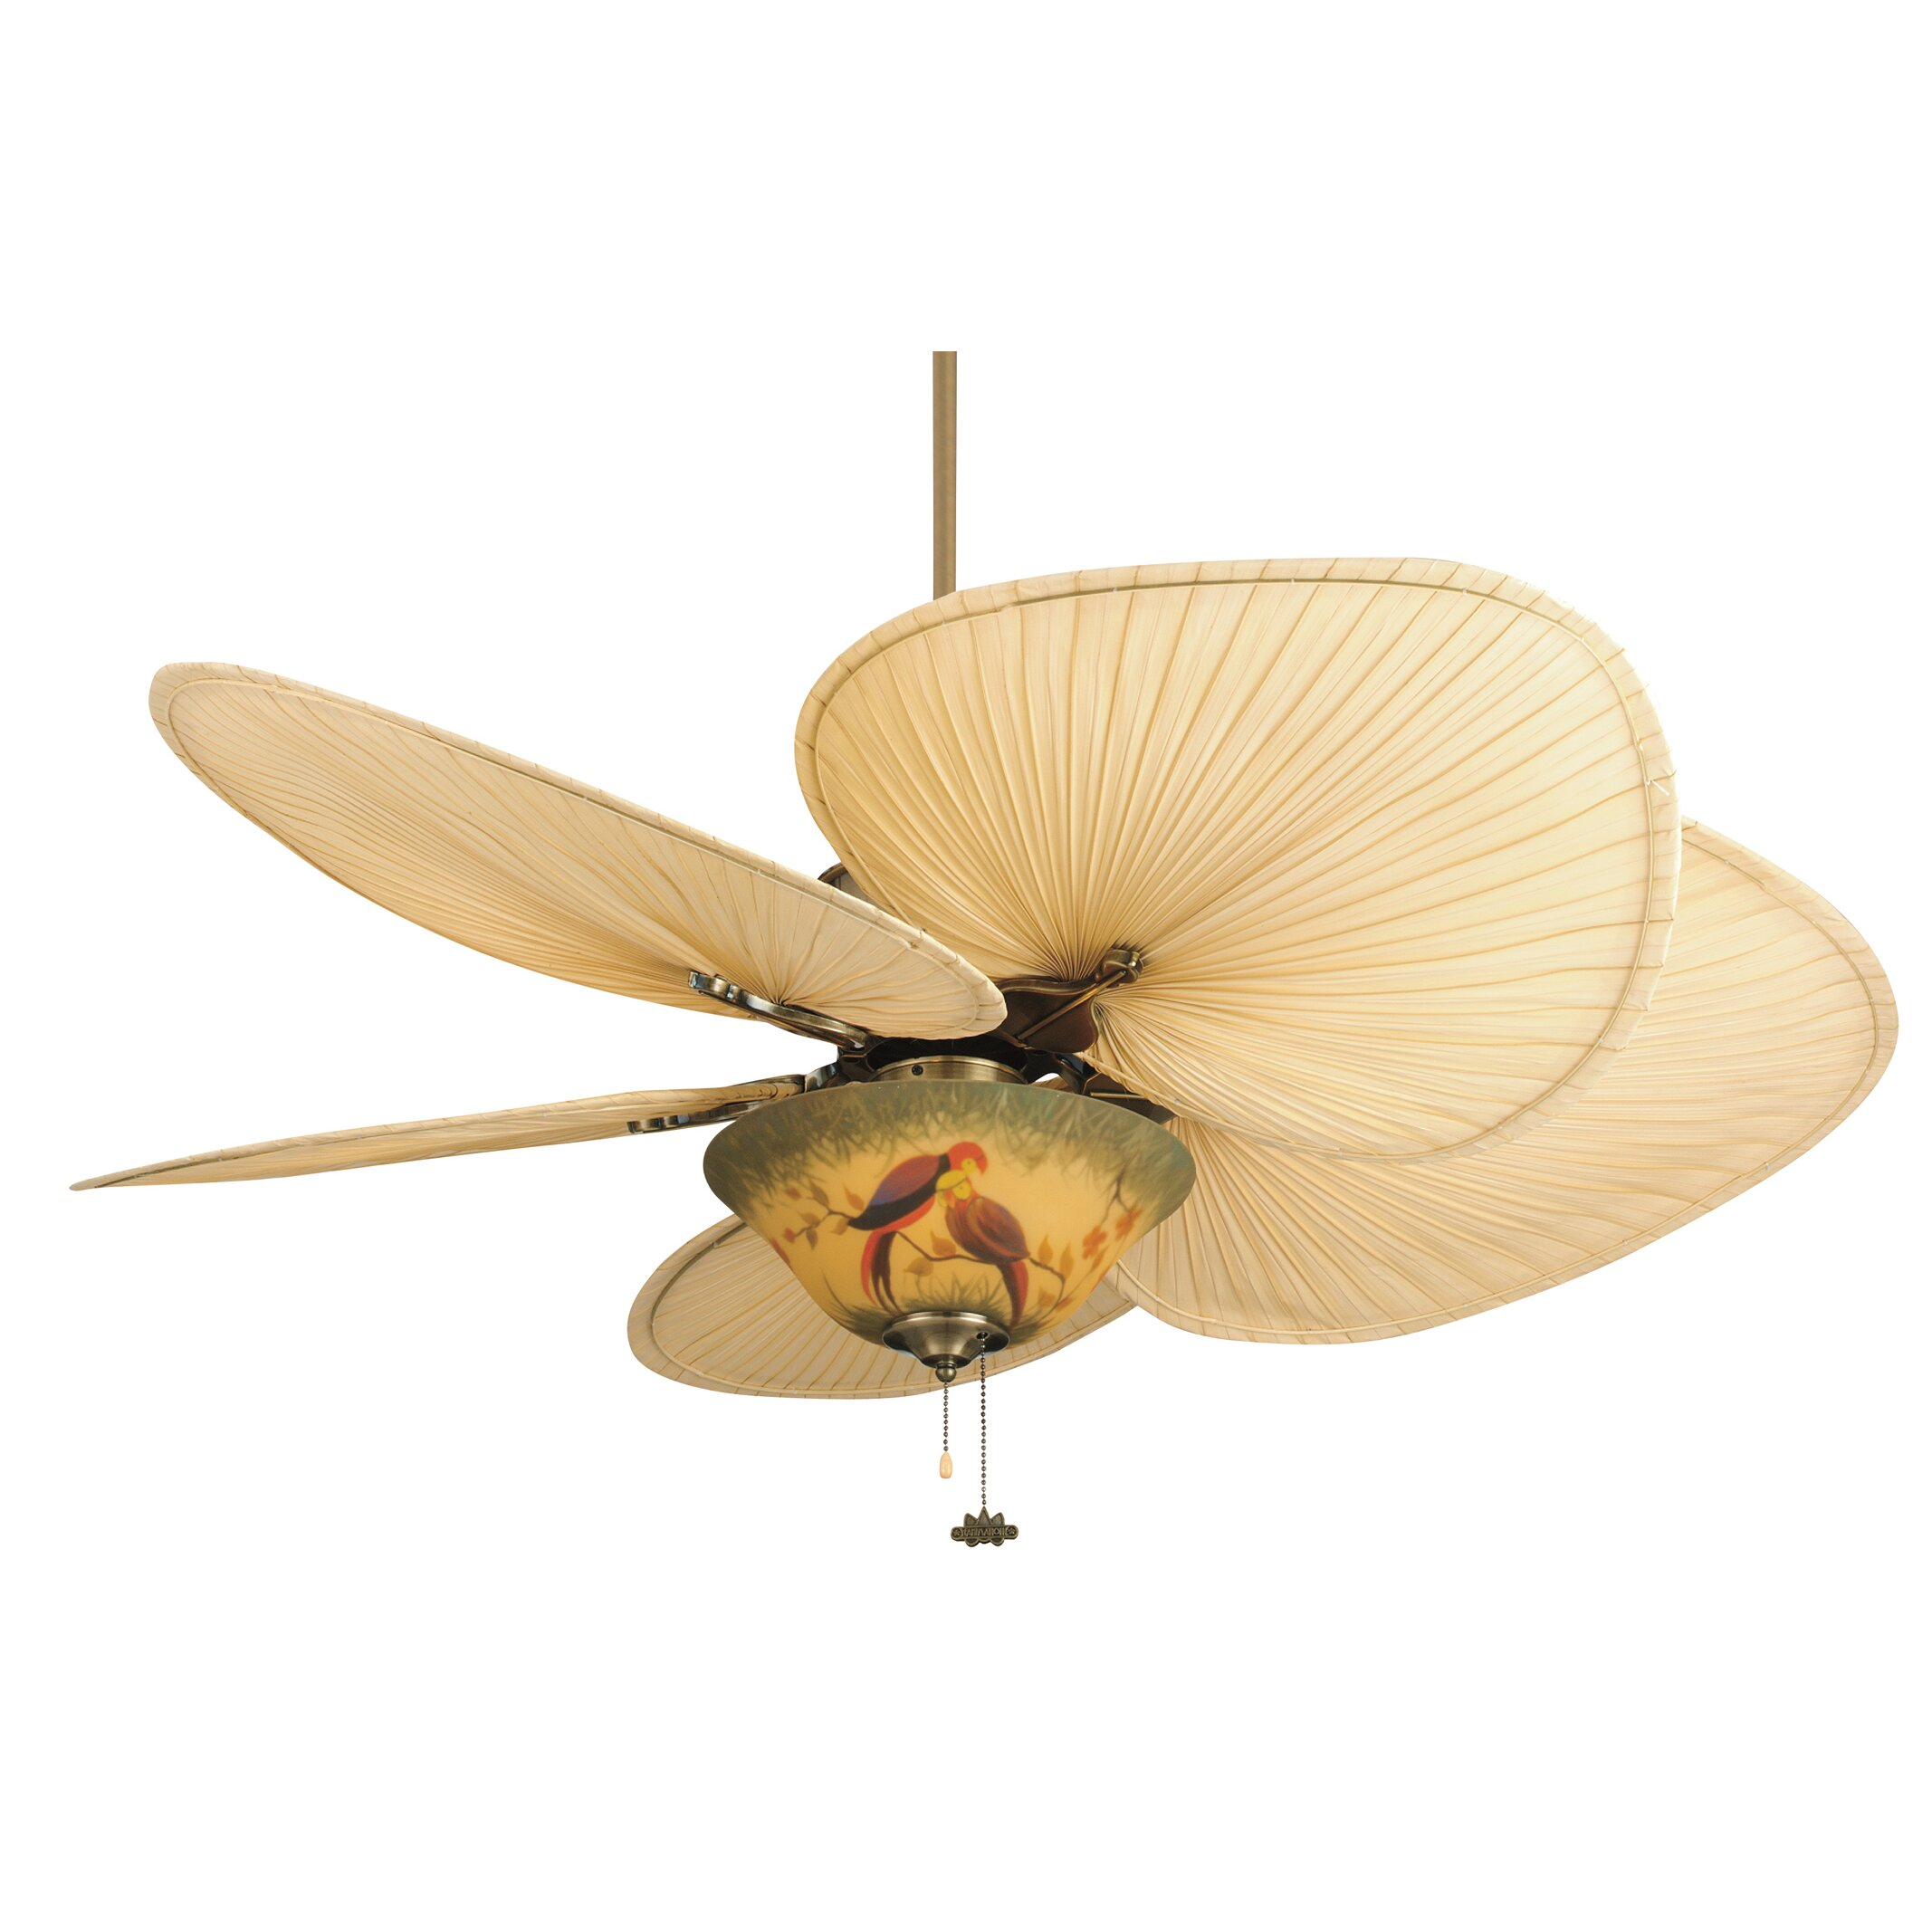 Ceiling fan with leaf blades - Fanimation 52 Quot Islander 5 Palm Blade Ceiling Fan